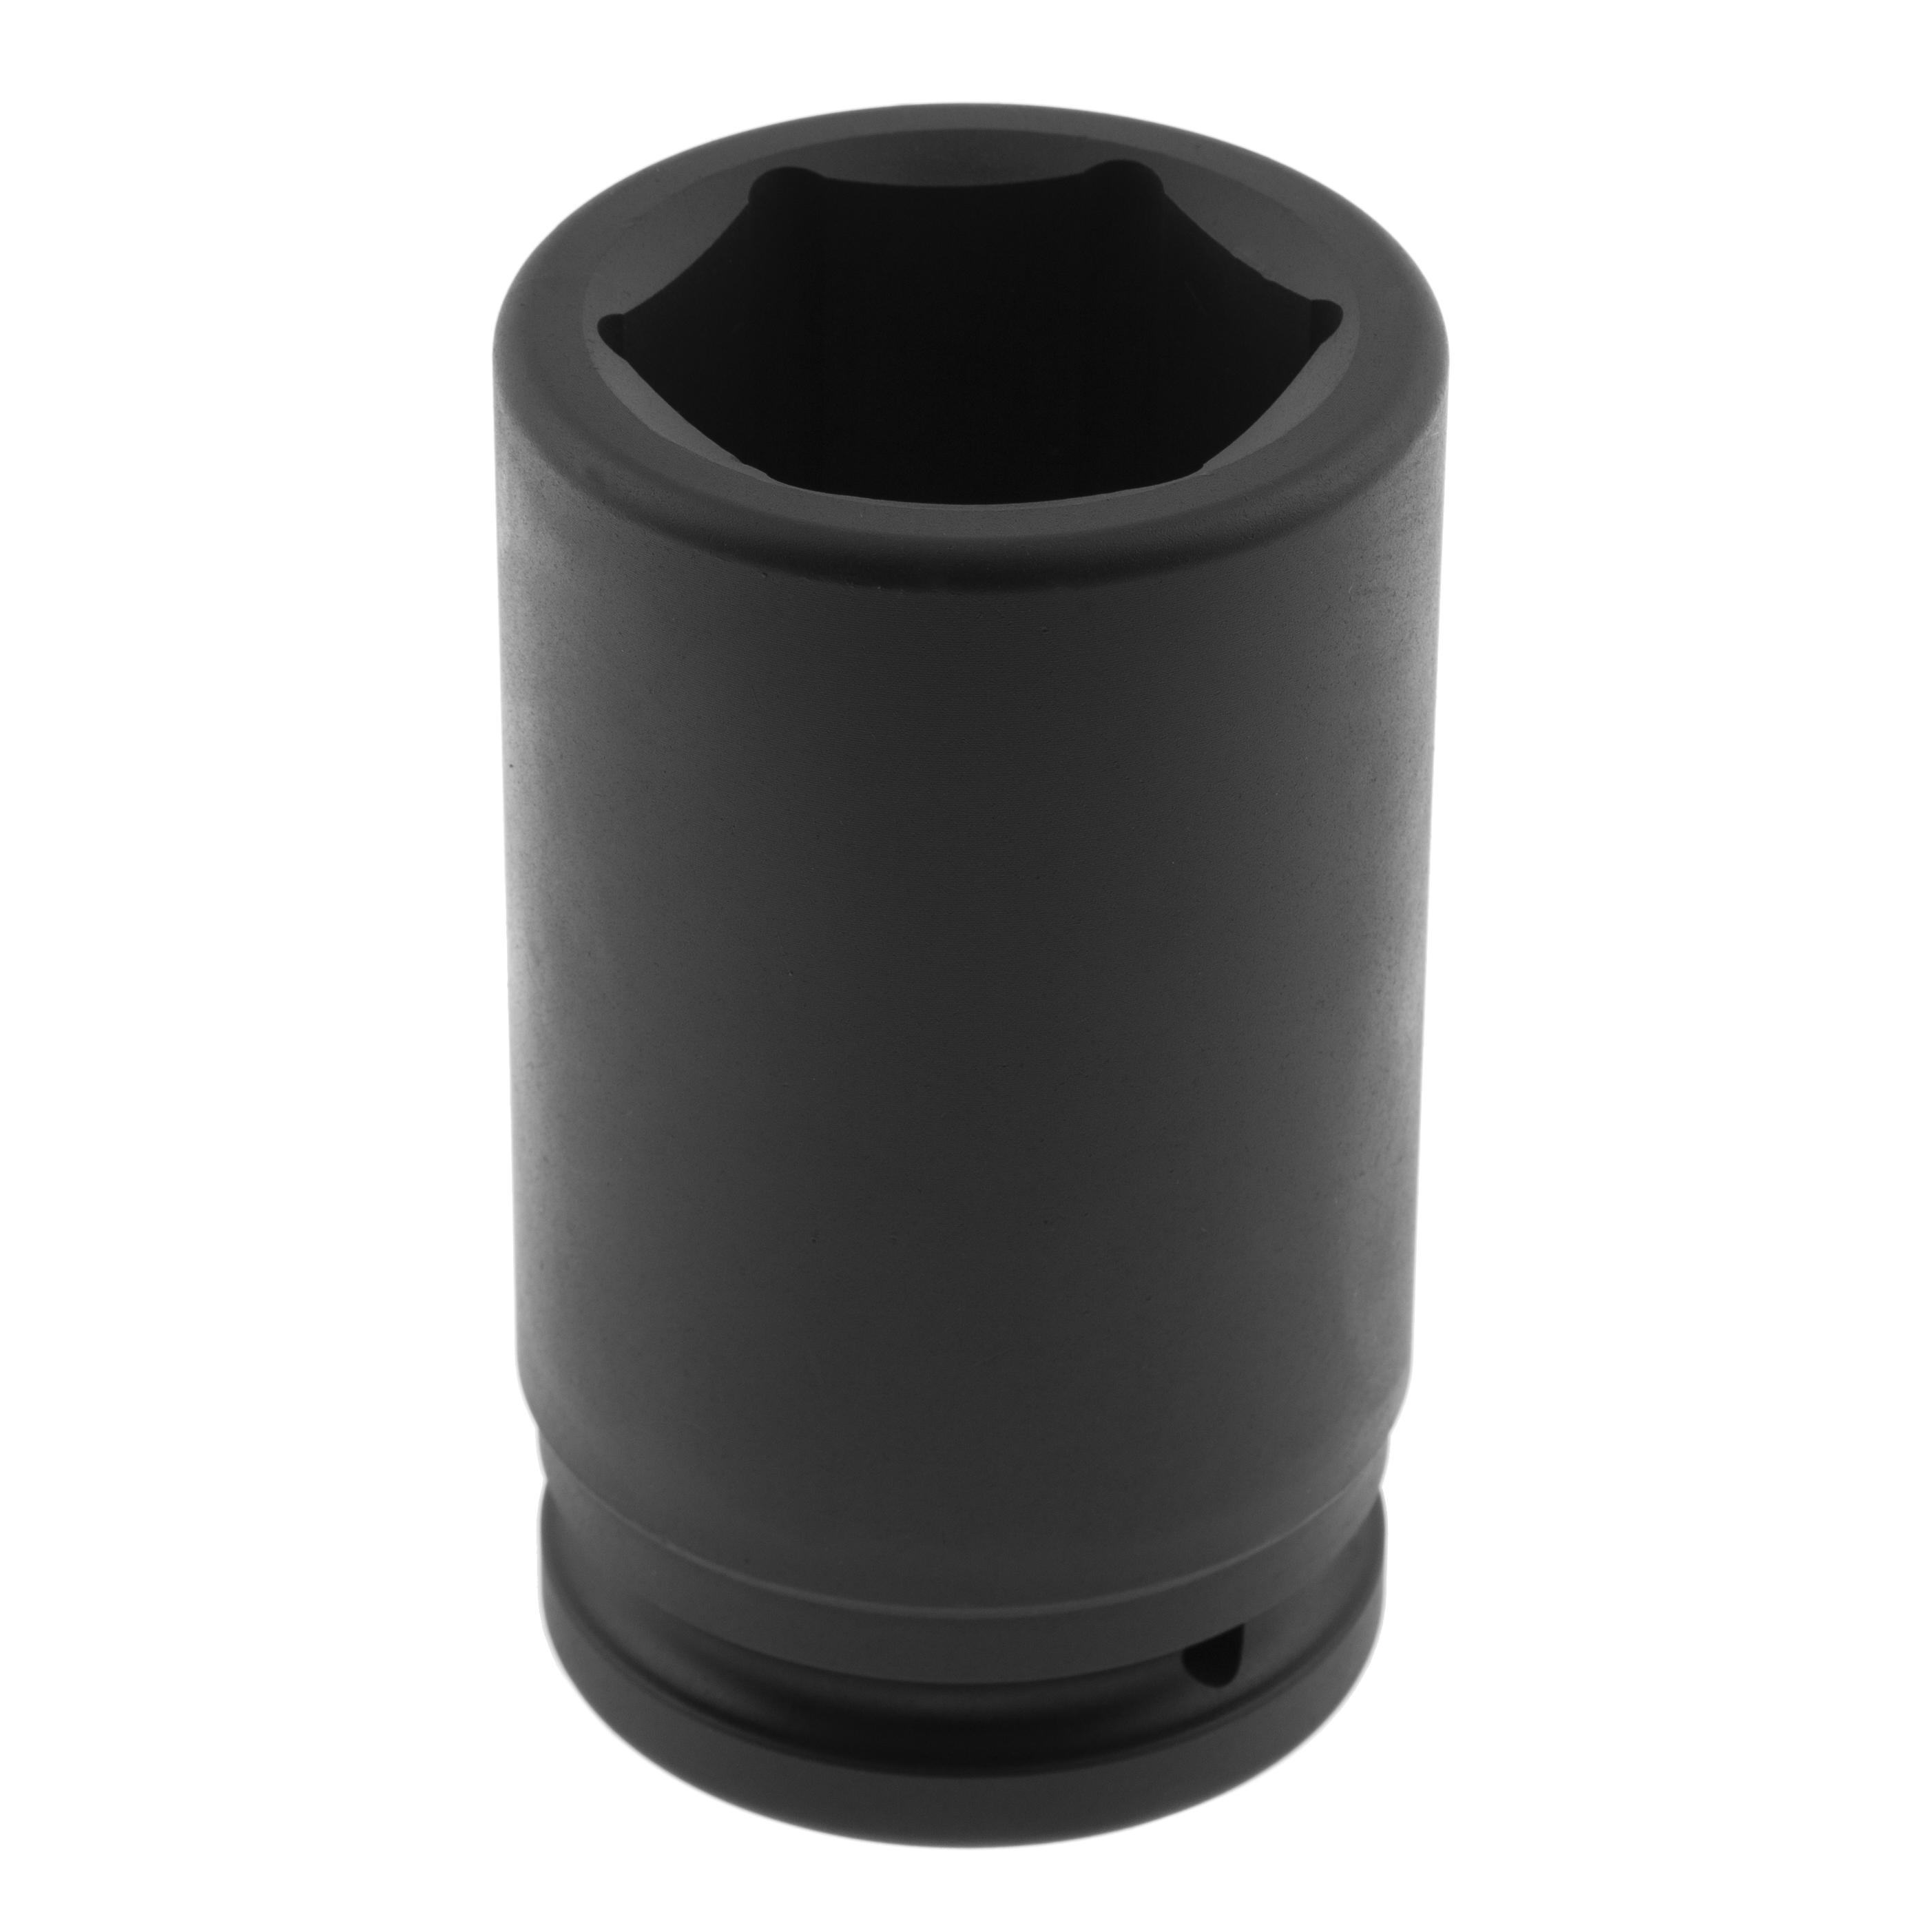 Головка Norgau N37kl-60 (064085060) головка norgau n37kl 80 064085080